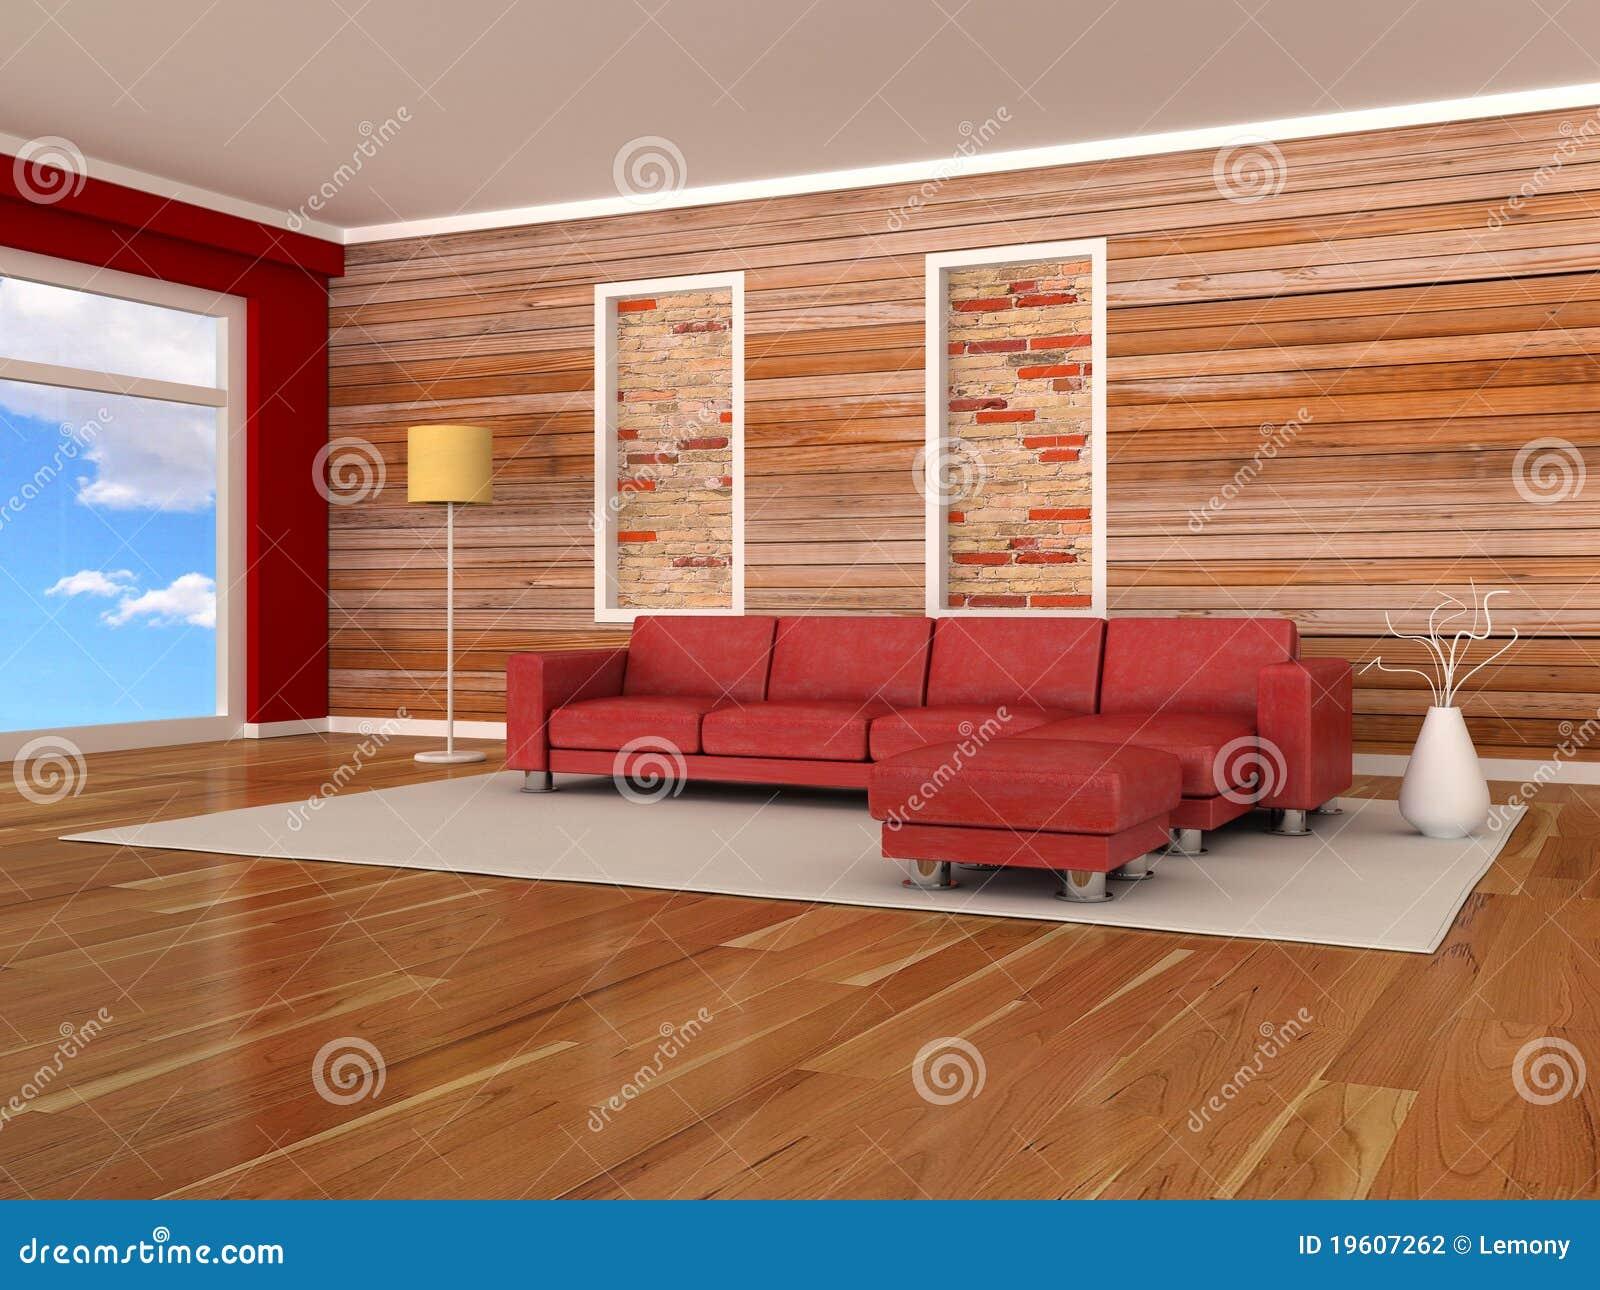 Interior Del Cuarto Moderno, Pared De Madera, Sofá Rojo Stock de ...